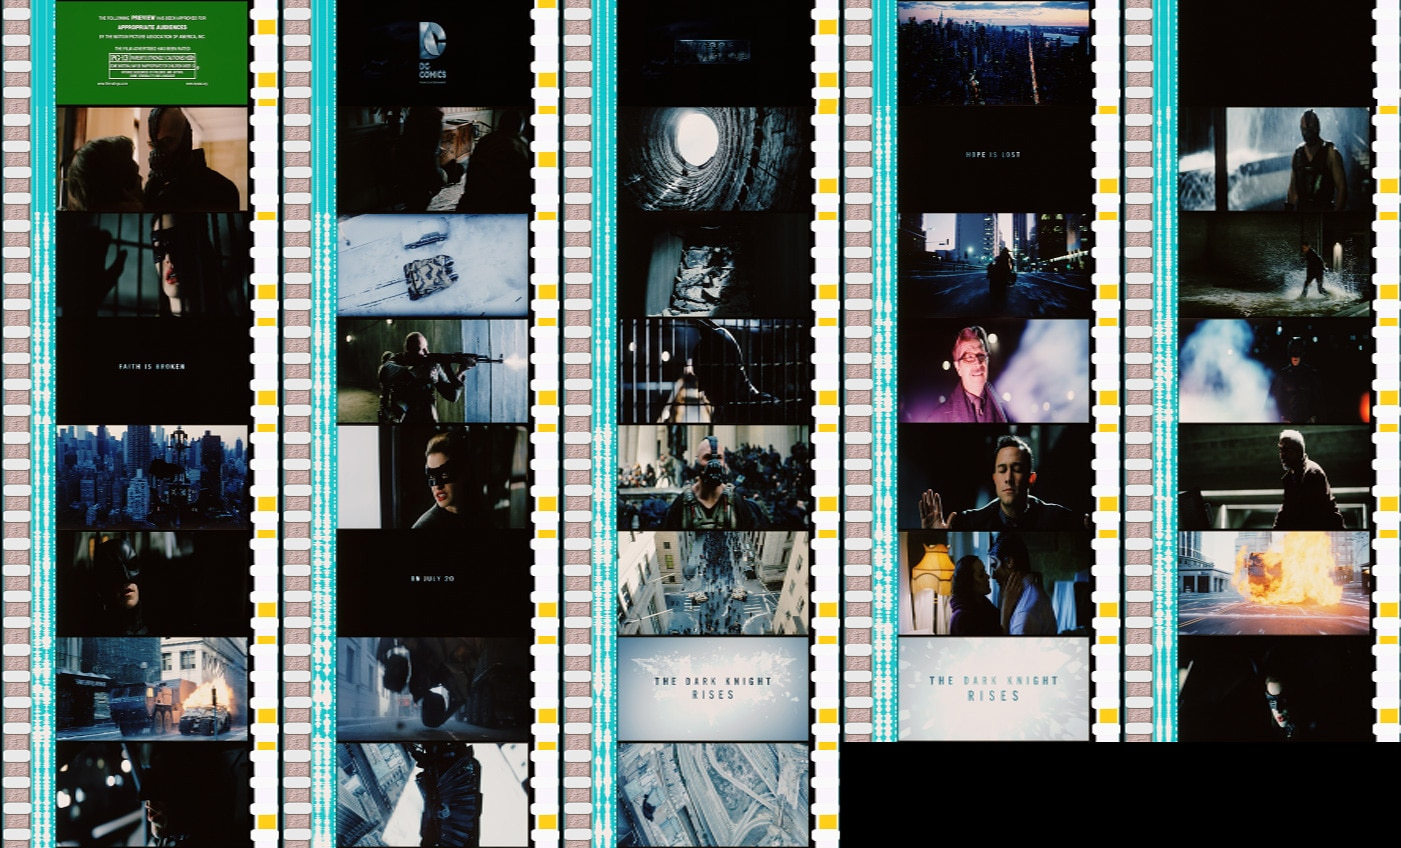 The-Dark-Knight-Rises-Viral-Reveals-New-Trailer-Screens-02